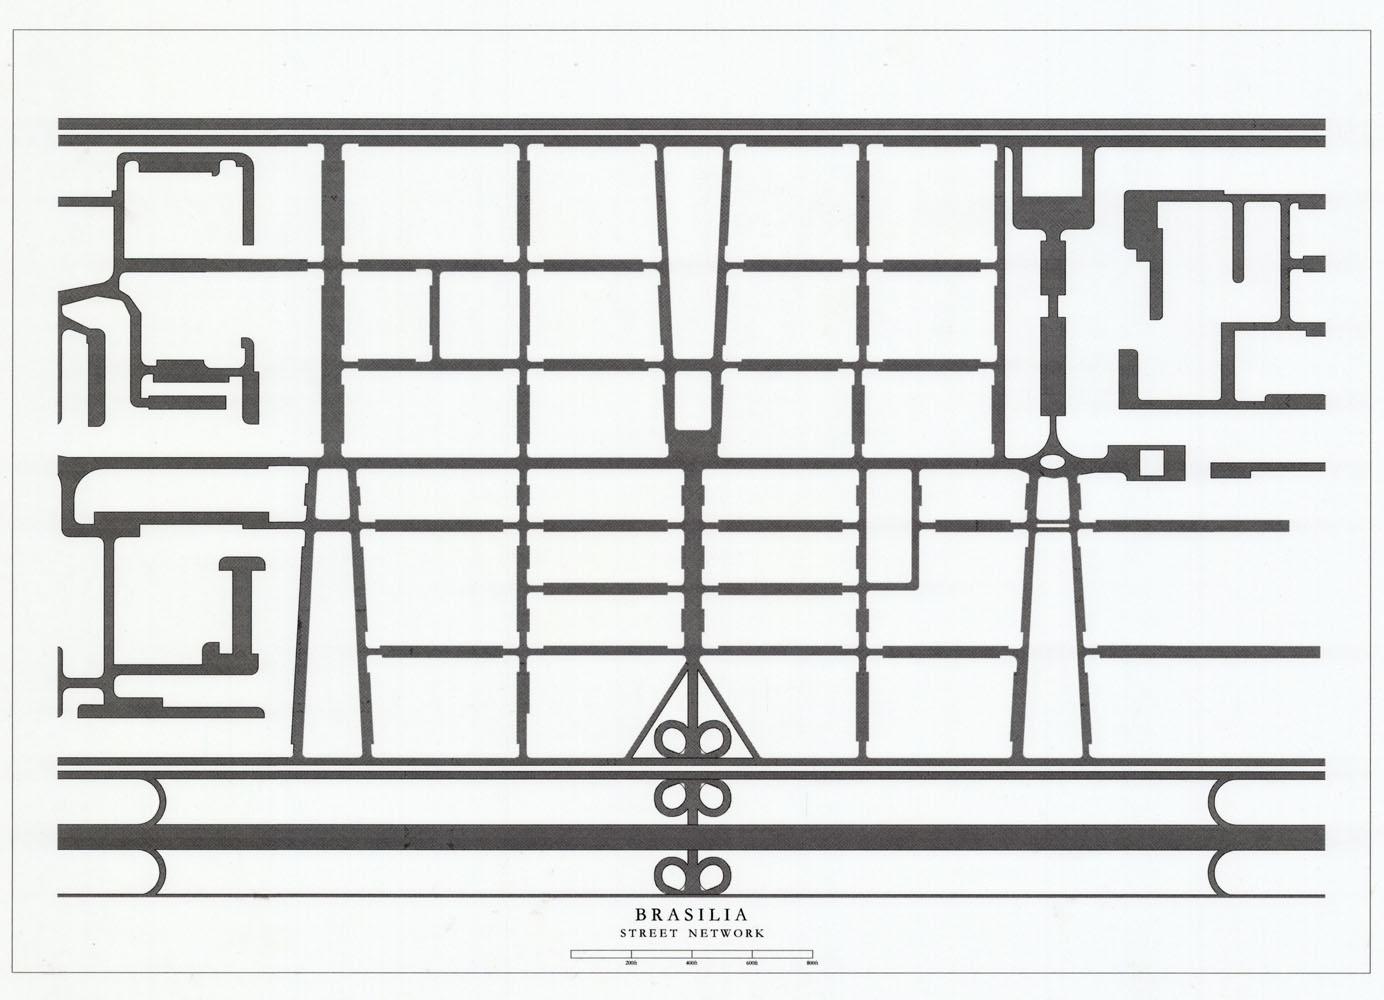 08 Street Network.jpg